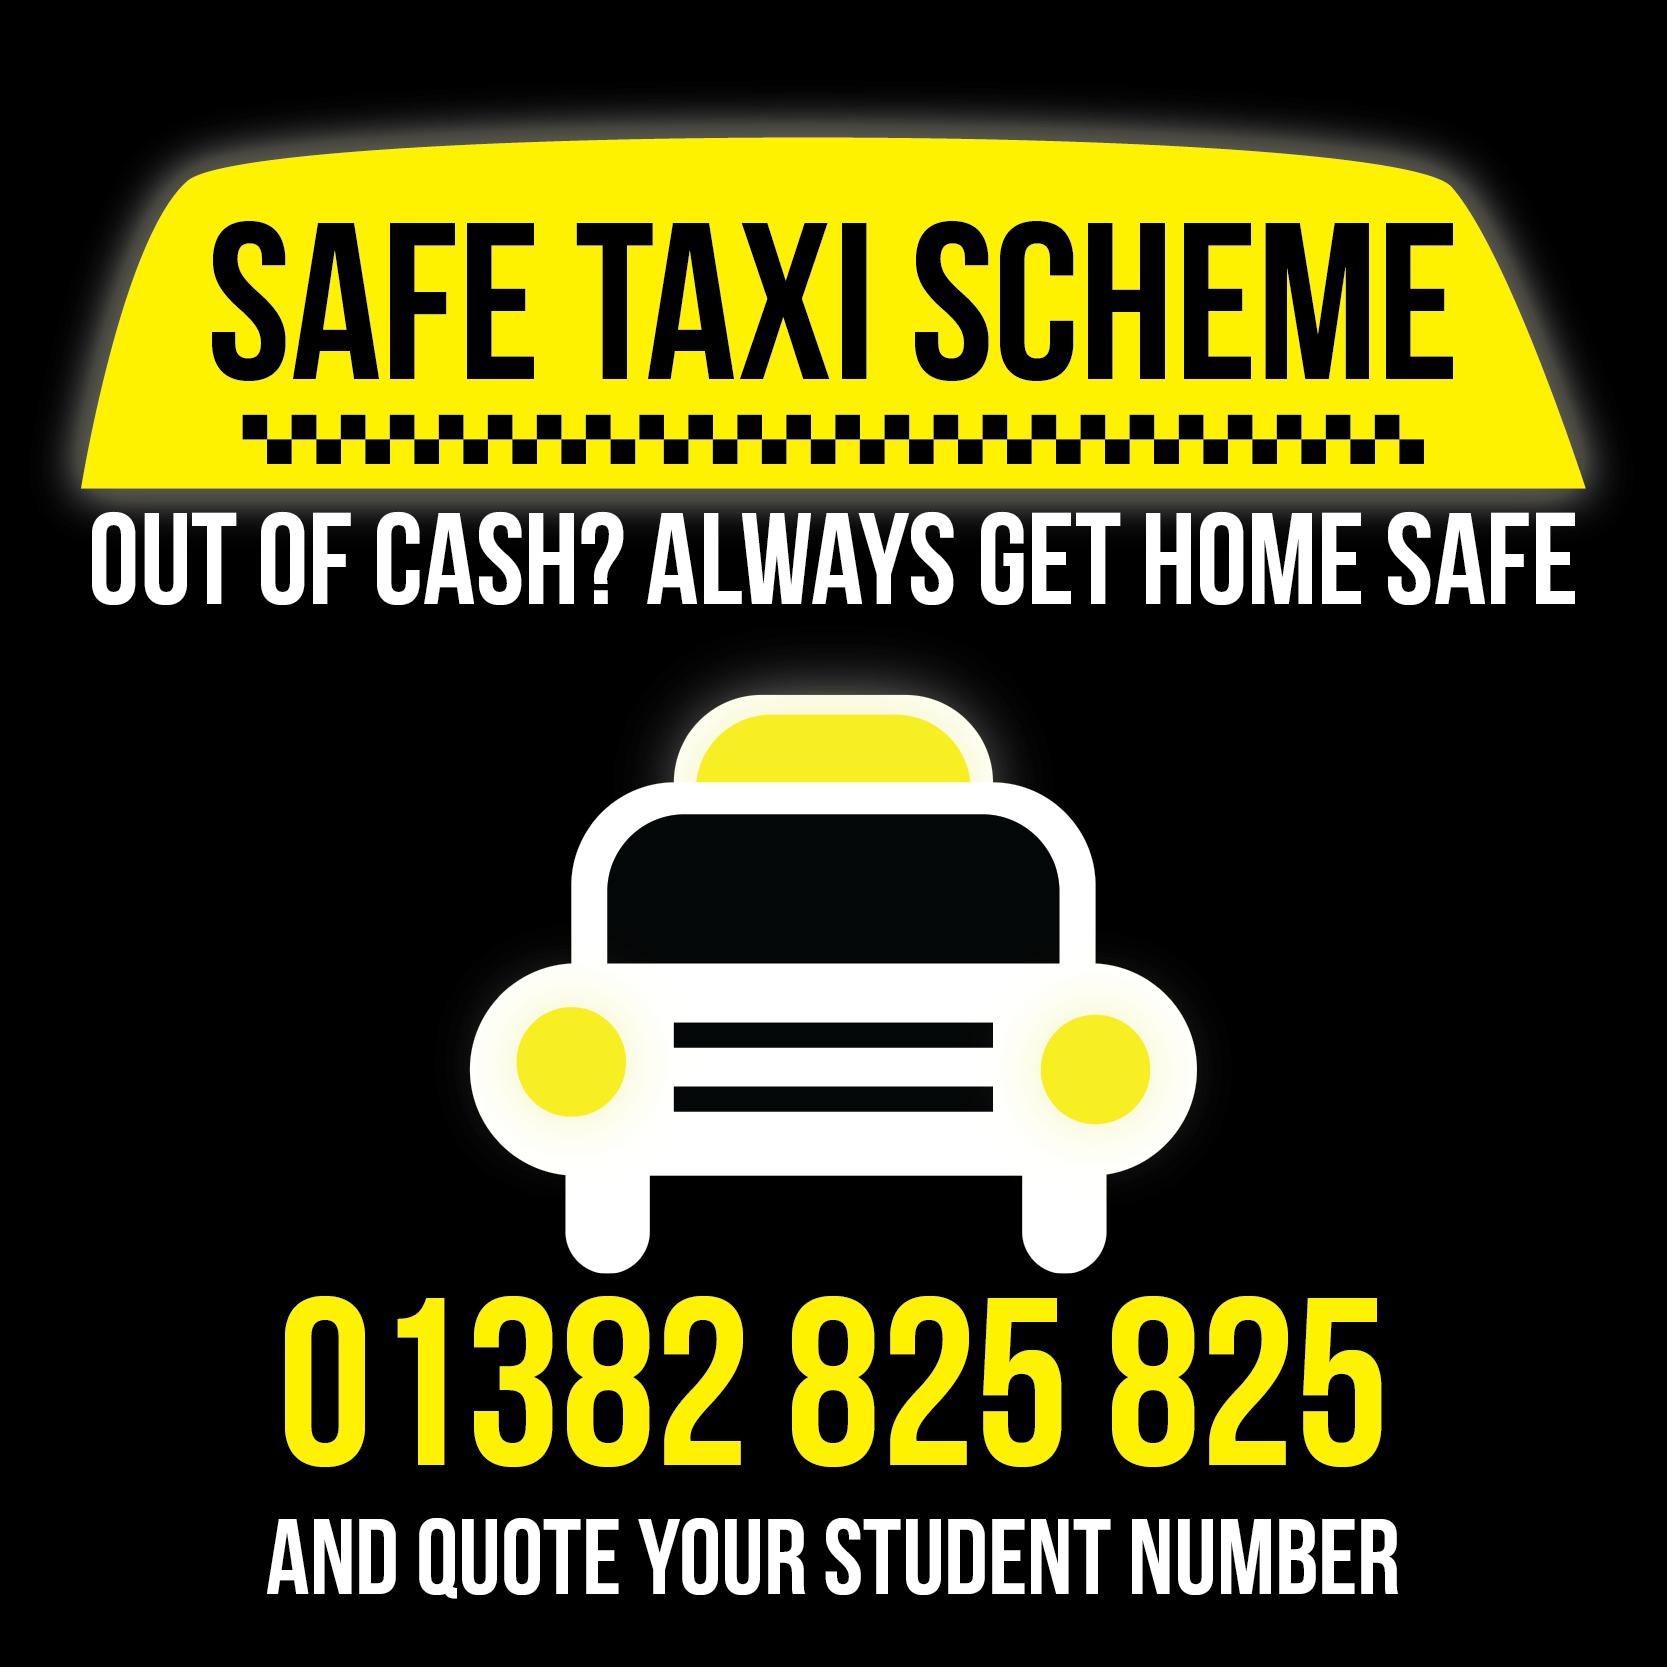 Safe Taxi Campaign